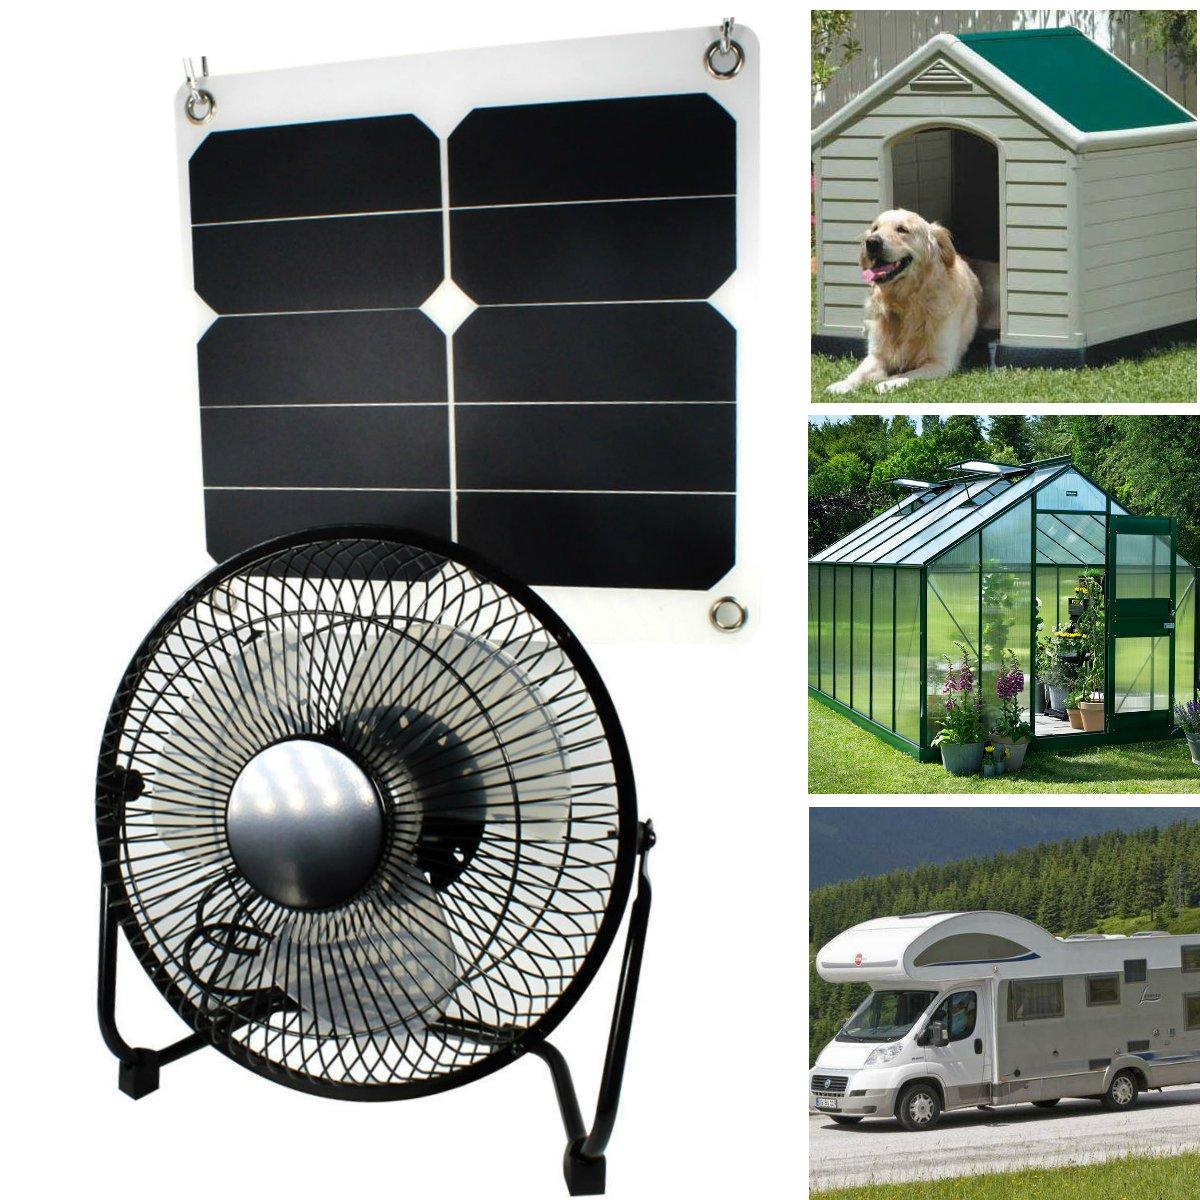 GOODSOZ 10W Solar Panel Fan Outdoor Home Chicken House RV Car Ventilation System